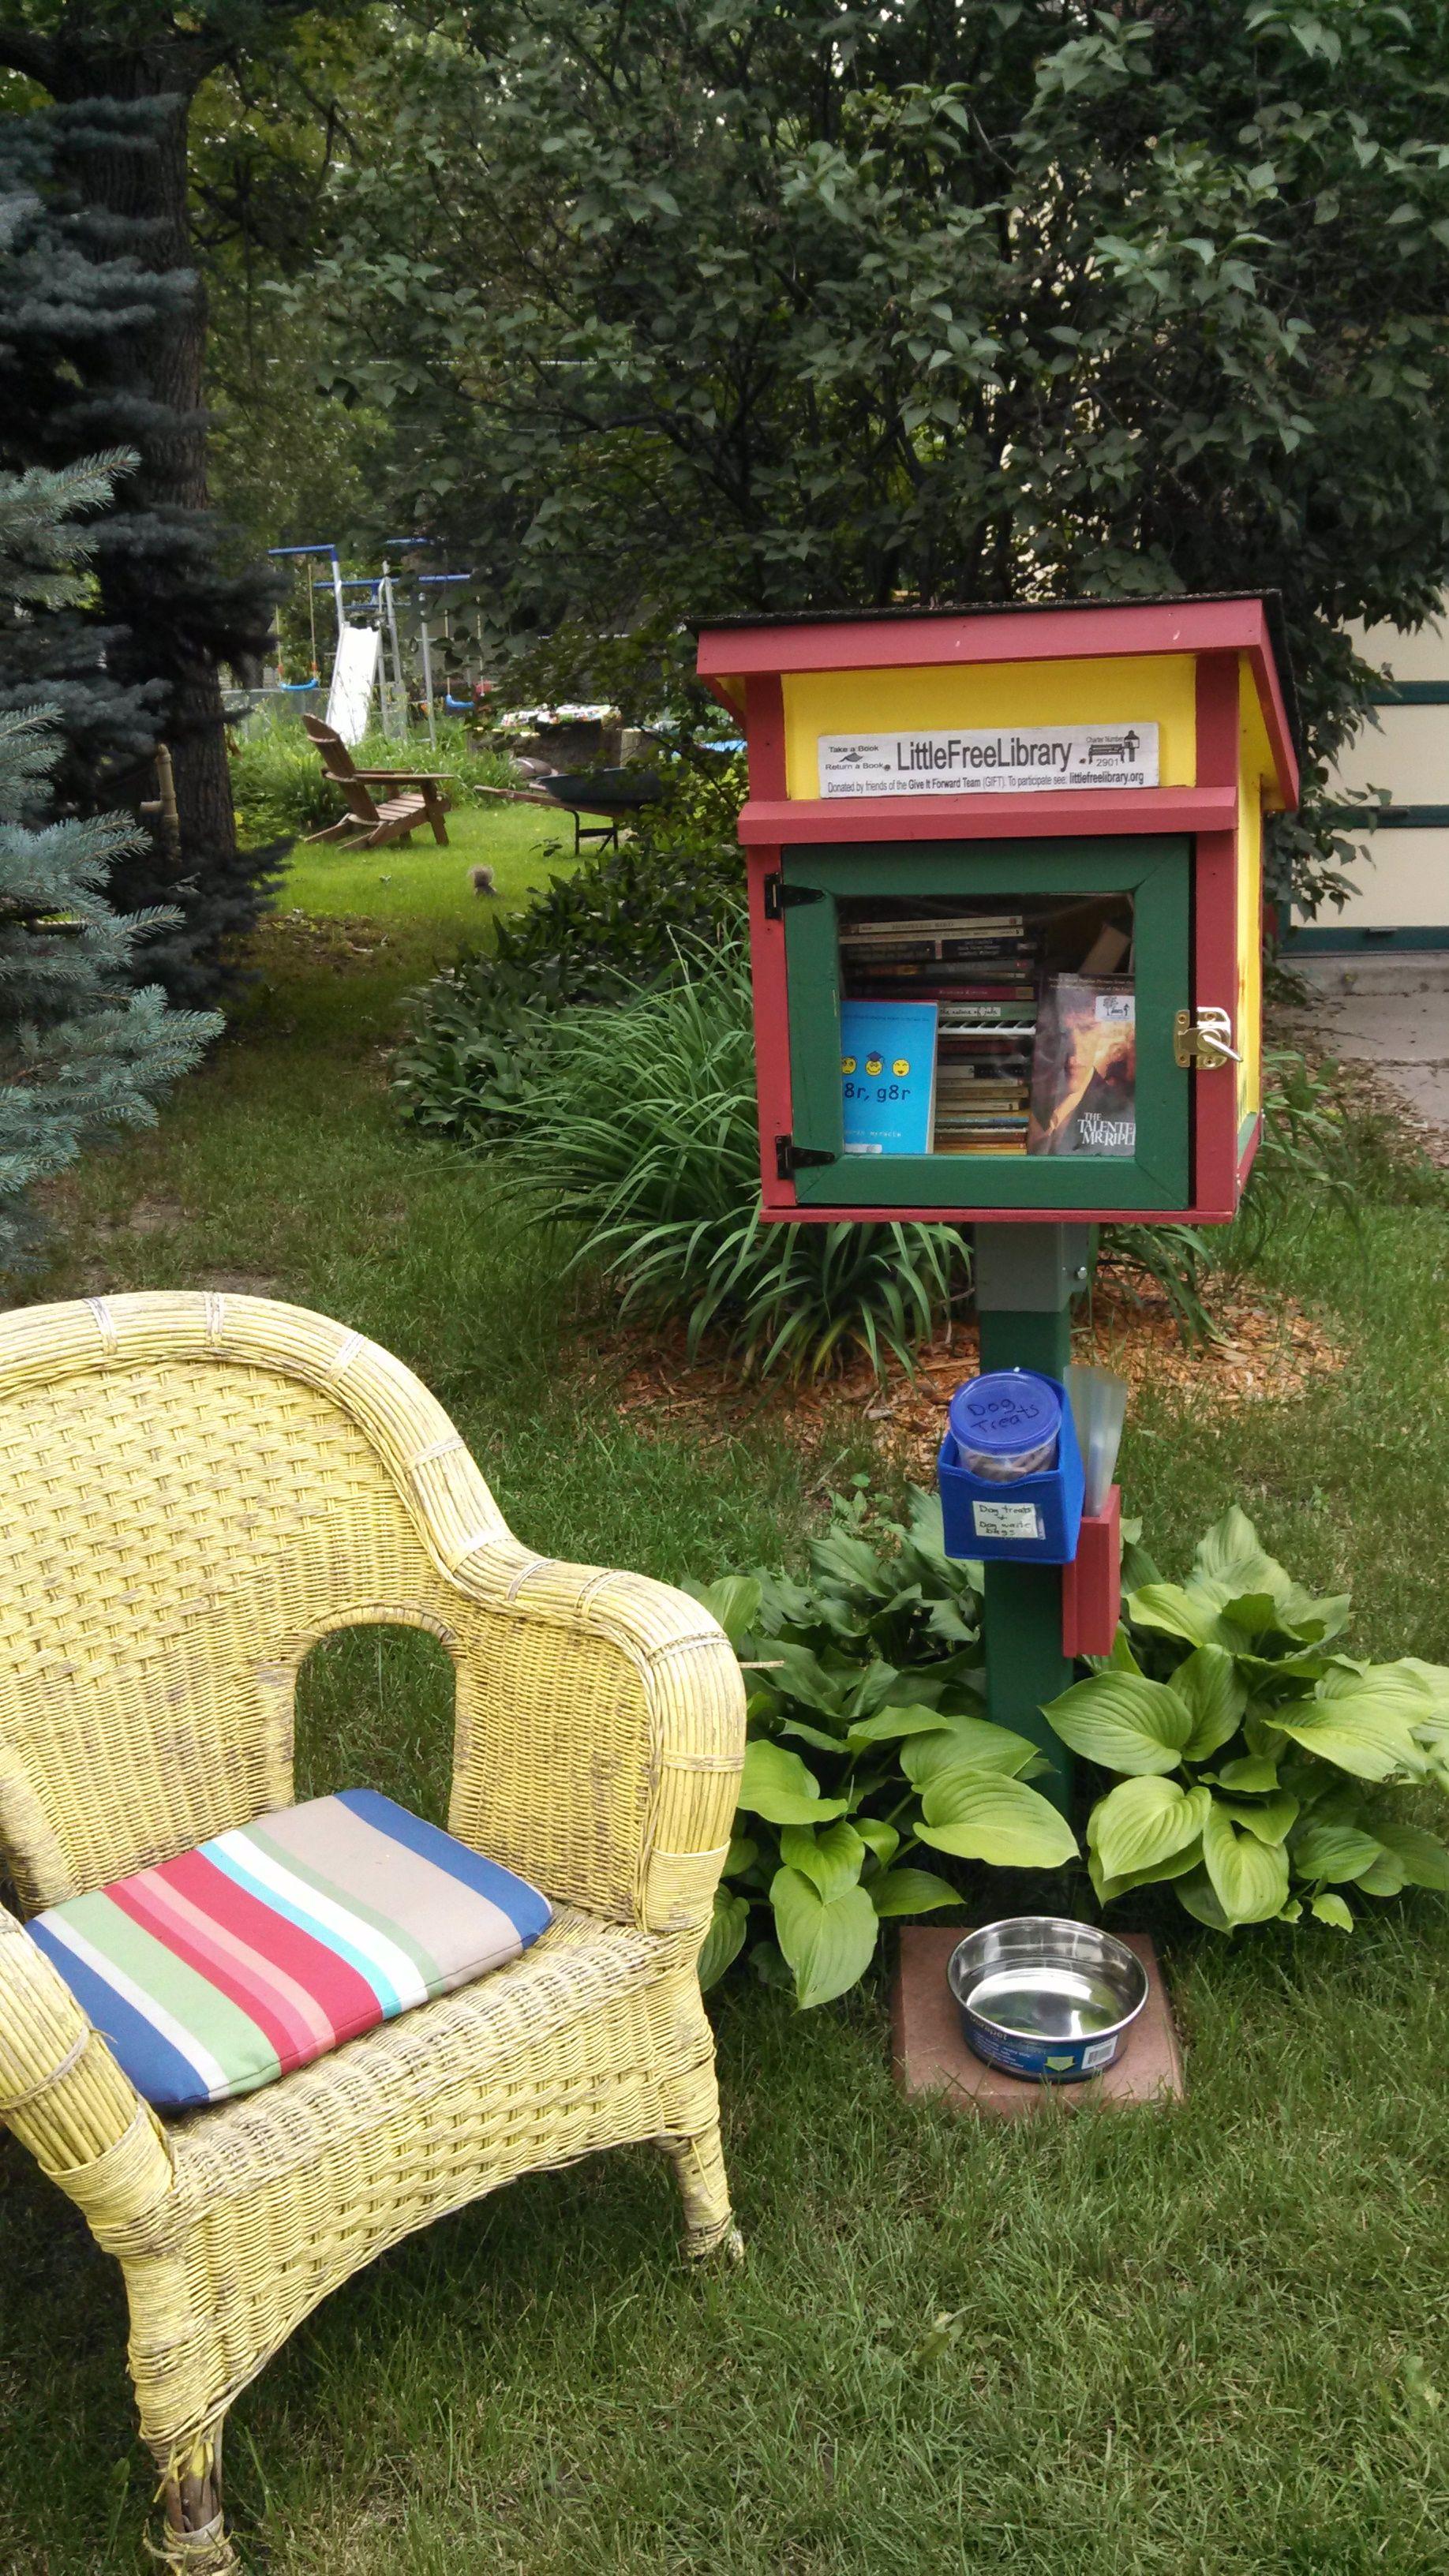 Cindy Roberts. Iowa City, IA. Little free libraries